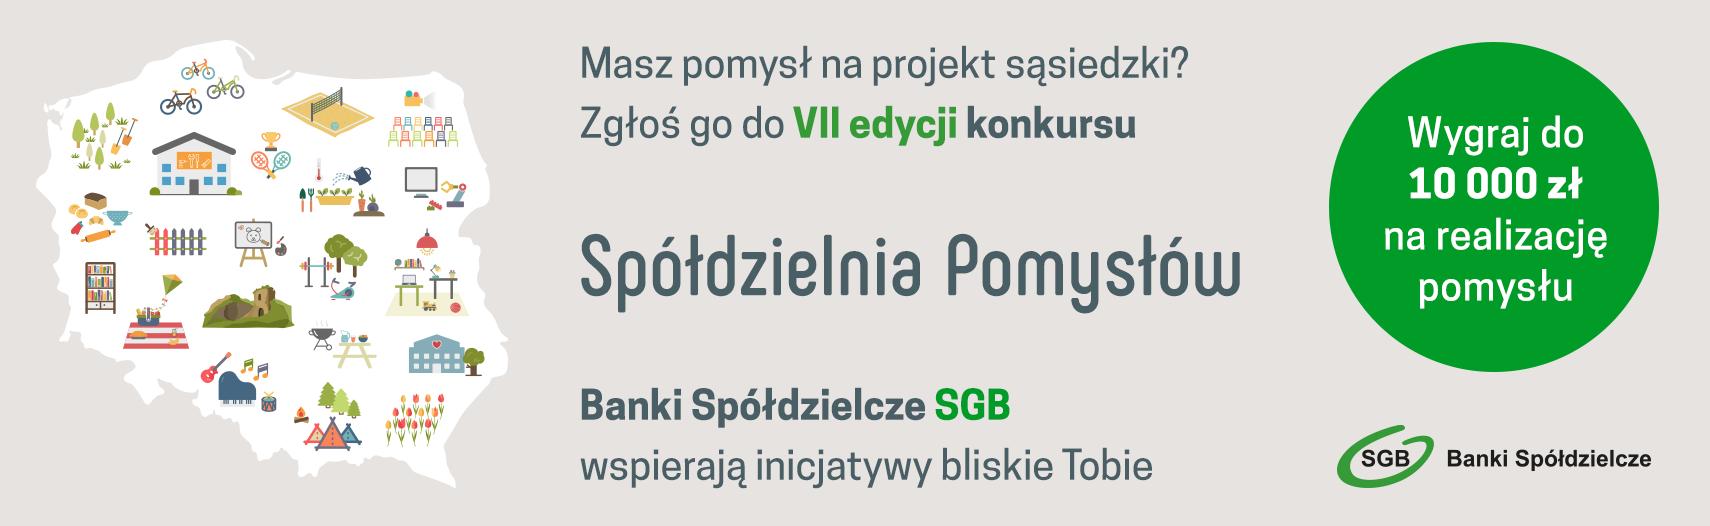 Baner_glowny_sp7